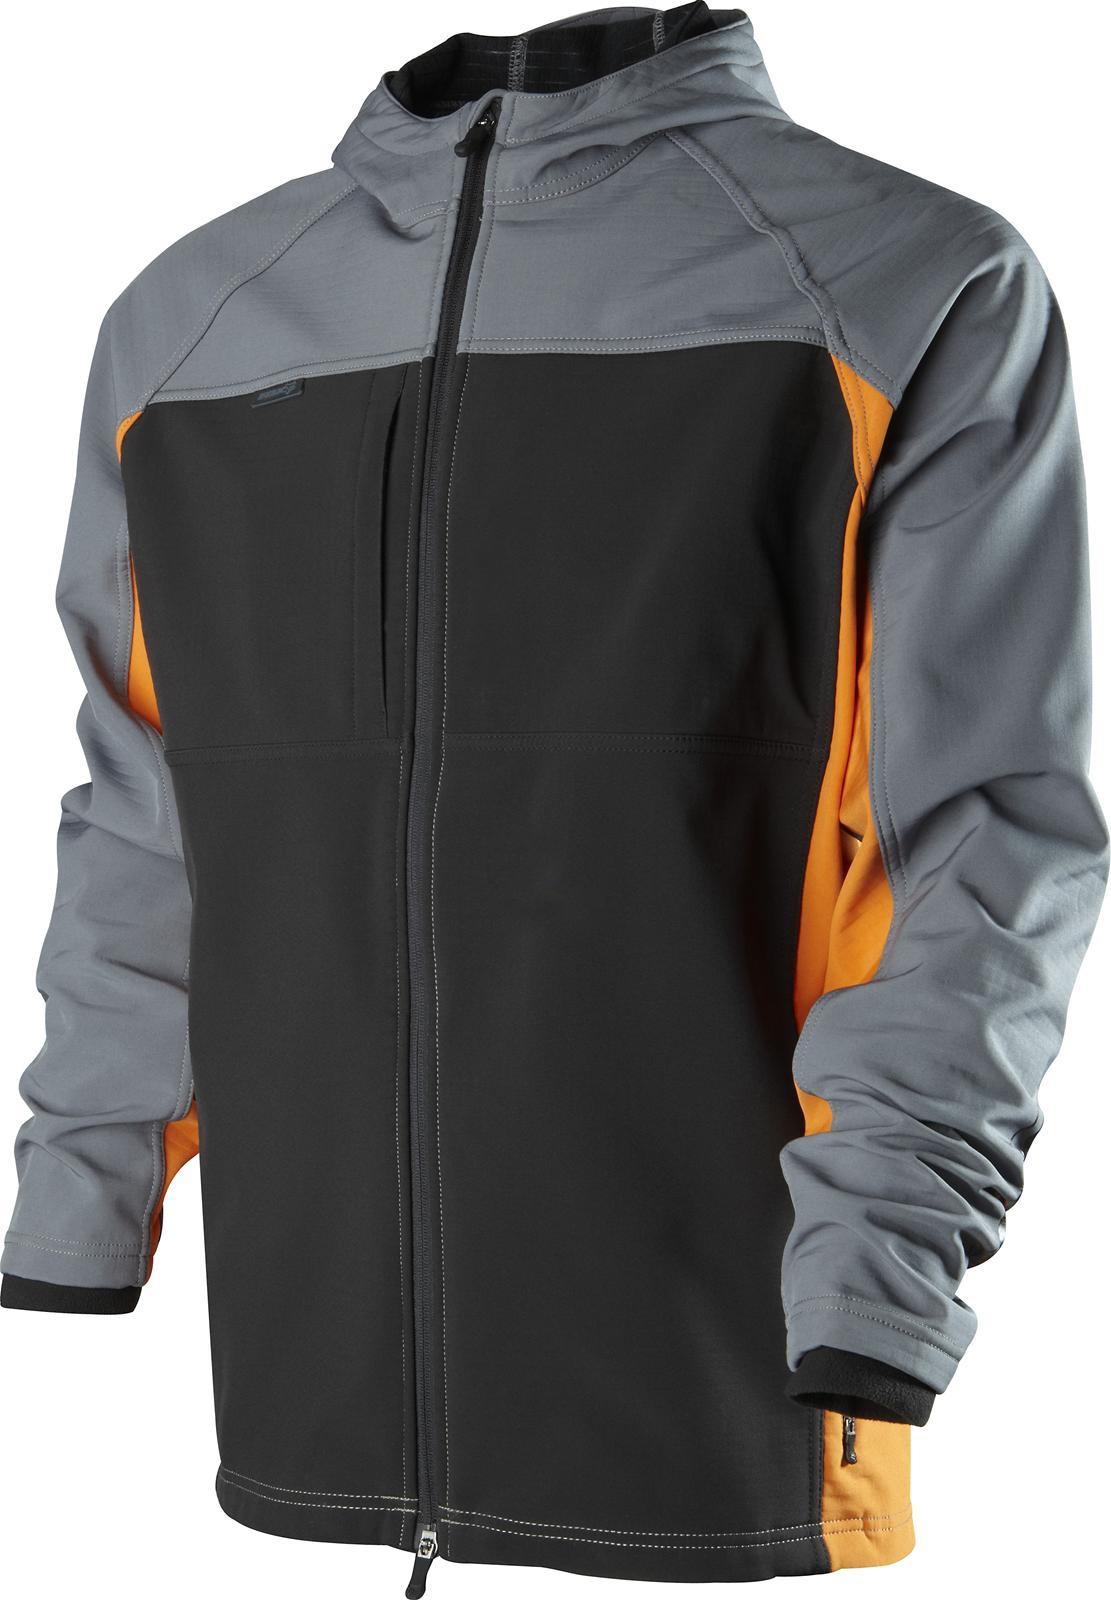 ���������� FOX Bionic Breakaway Jacket Graphite-Black XL 02228-535-XL